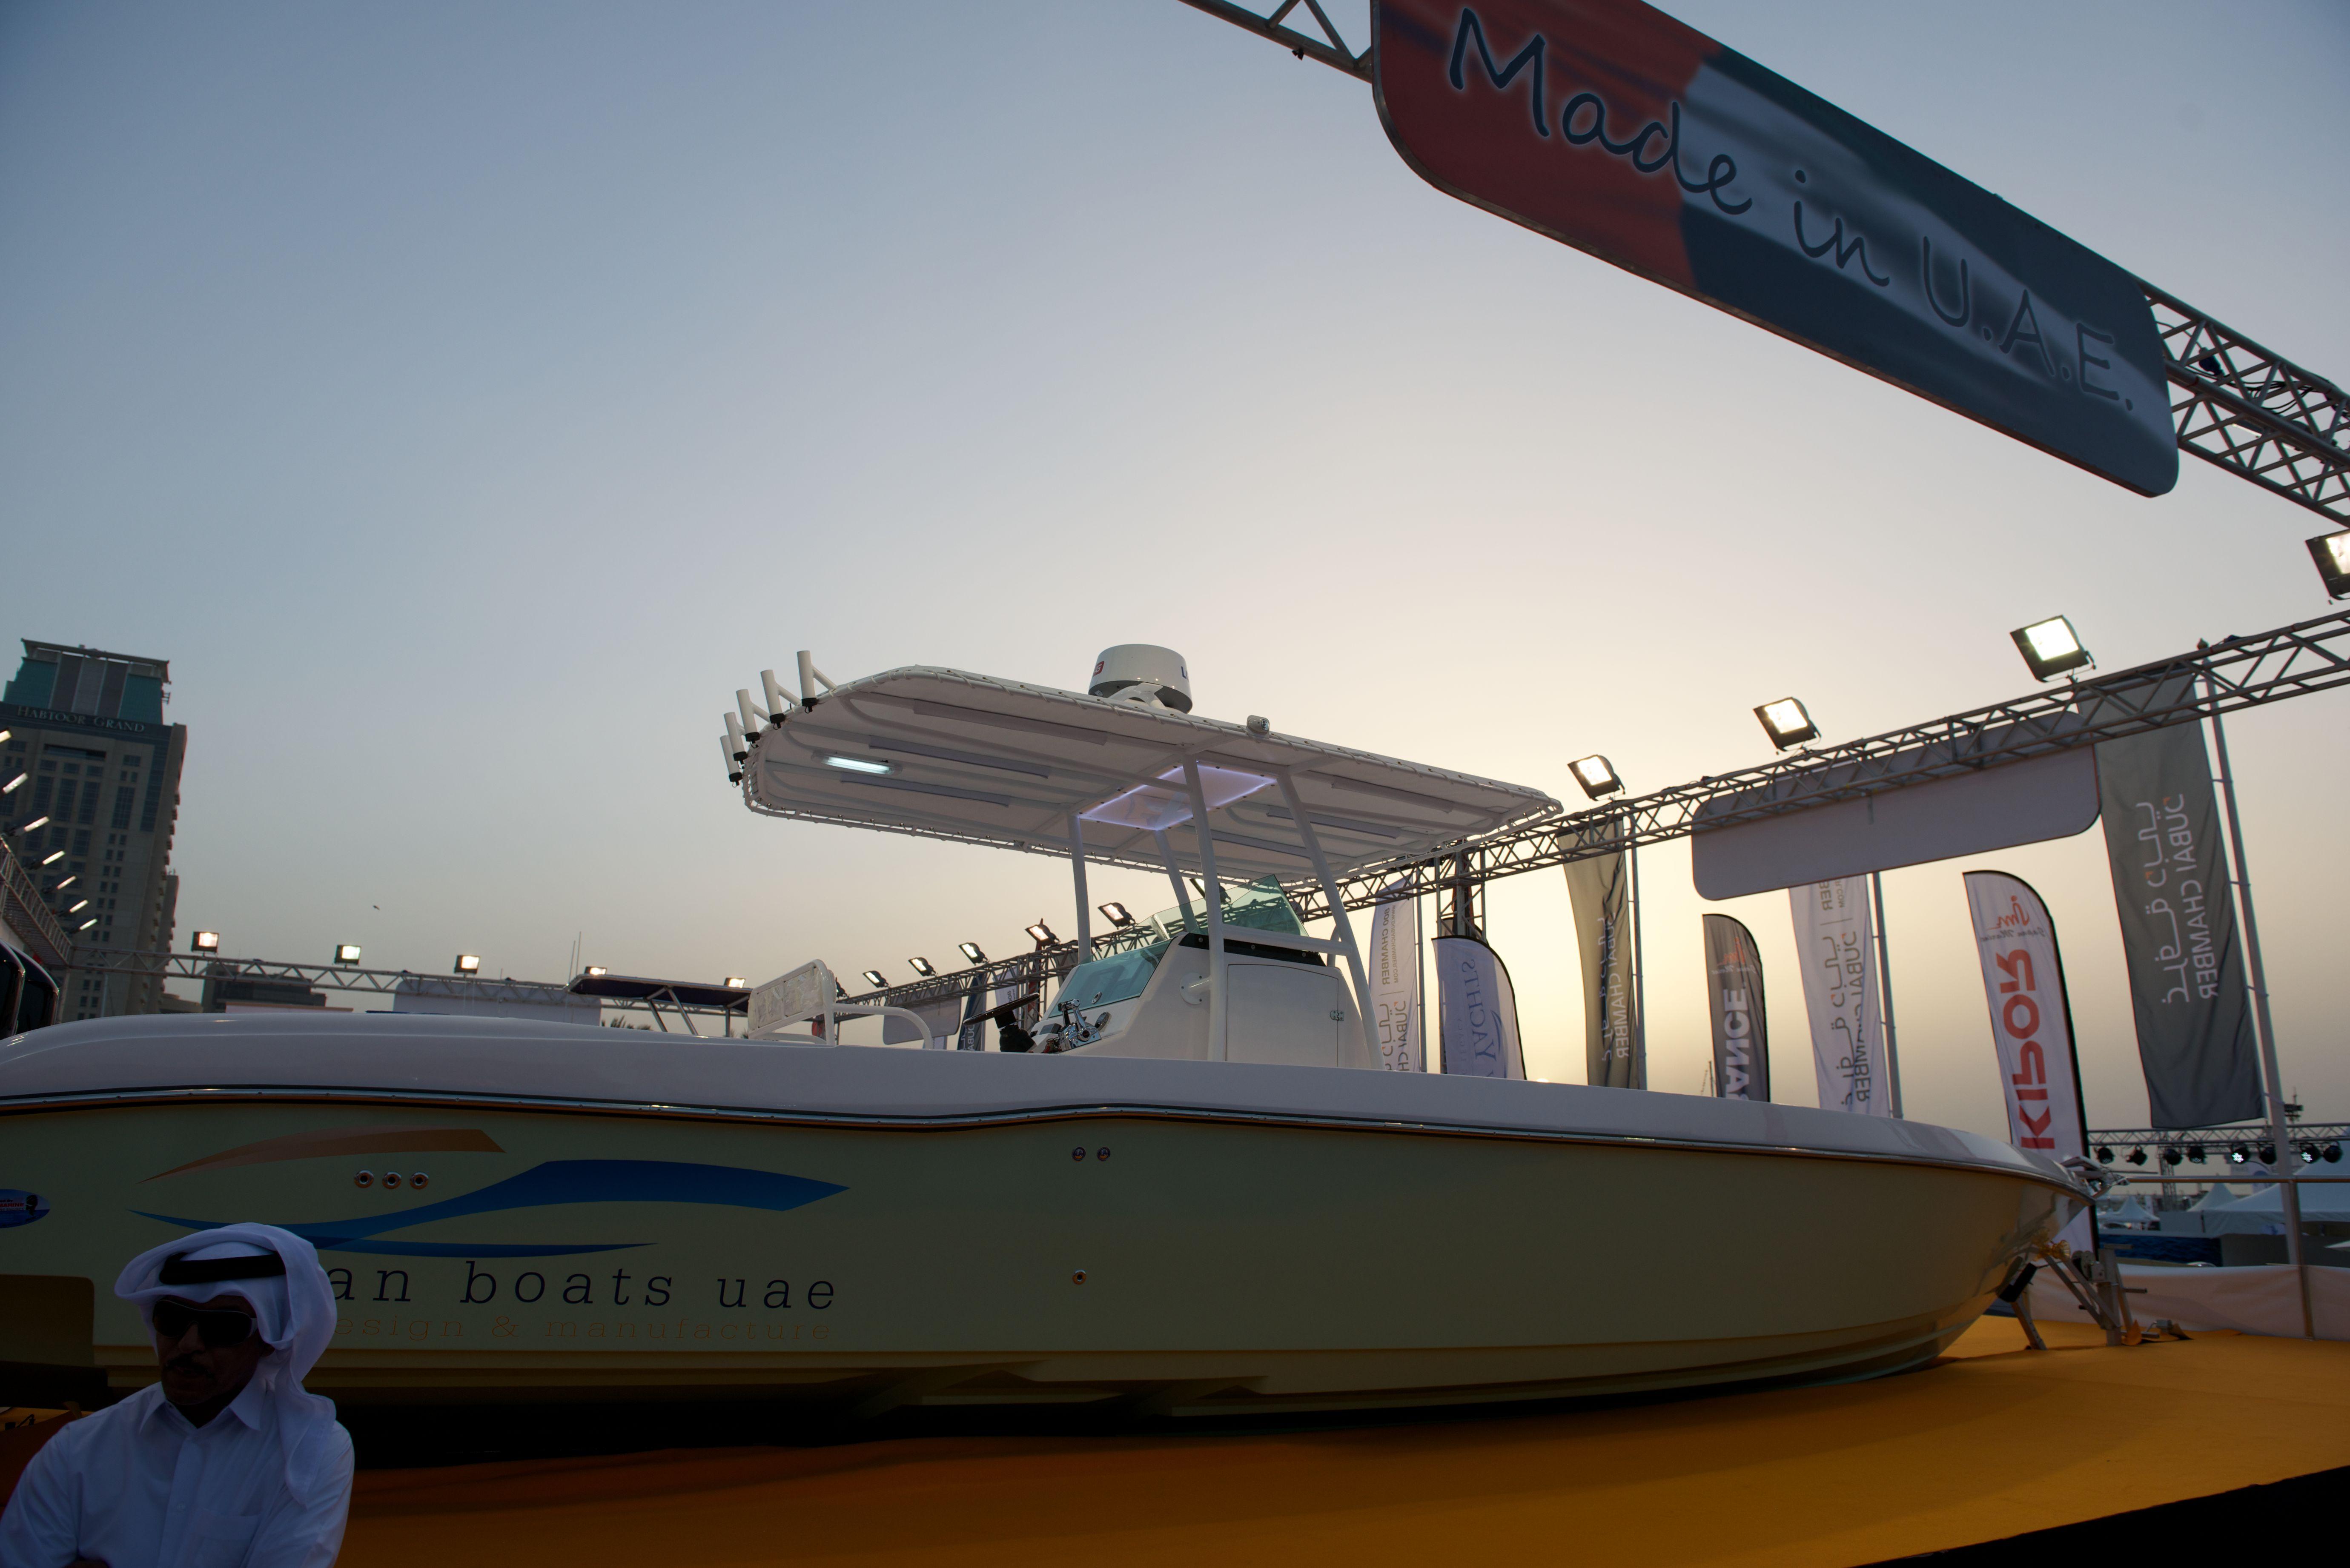 It is happening in the UAE - yes it is! : @DubaiBoat Maritime